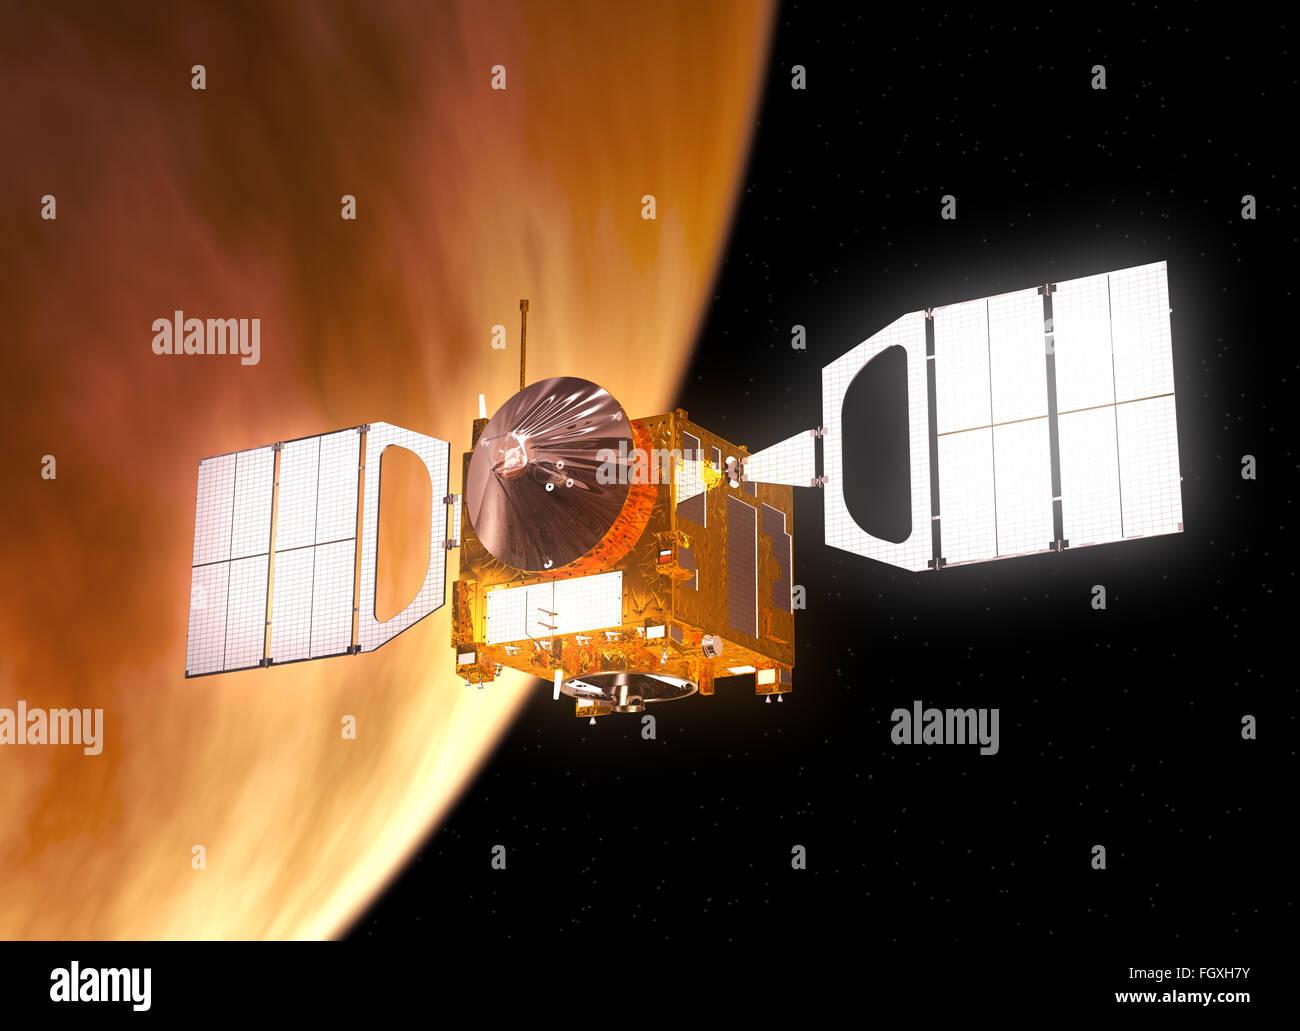 Interplanetary Space Station Orbiting Planet Venus. 3D Scene. - Stock Image